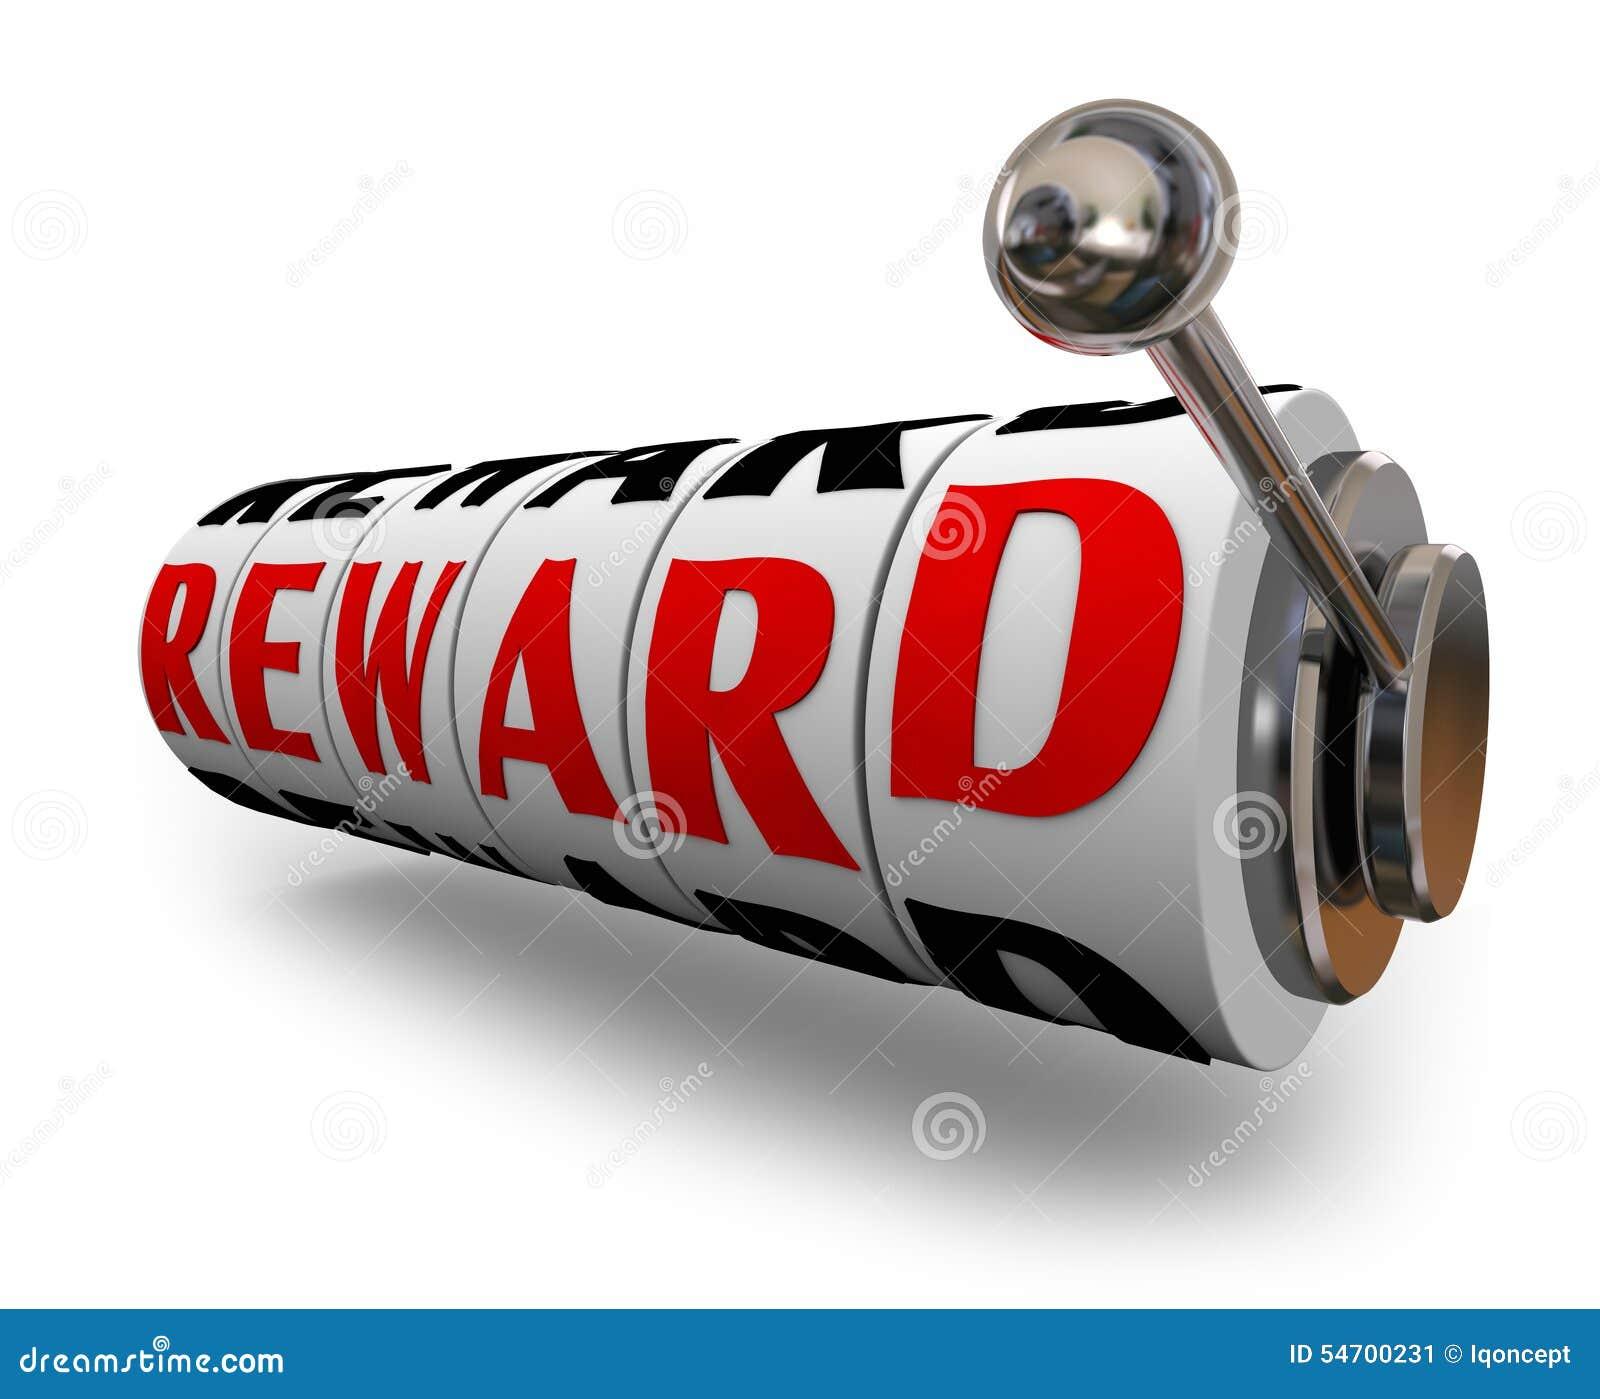 Tulalip casino rewards login